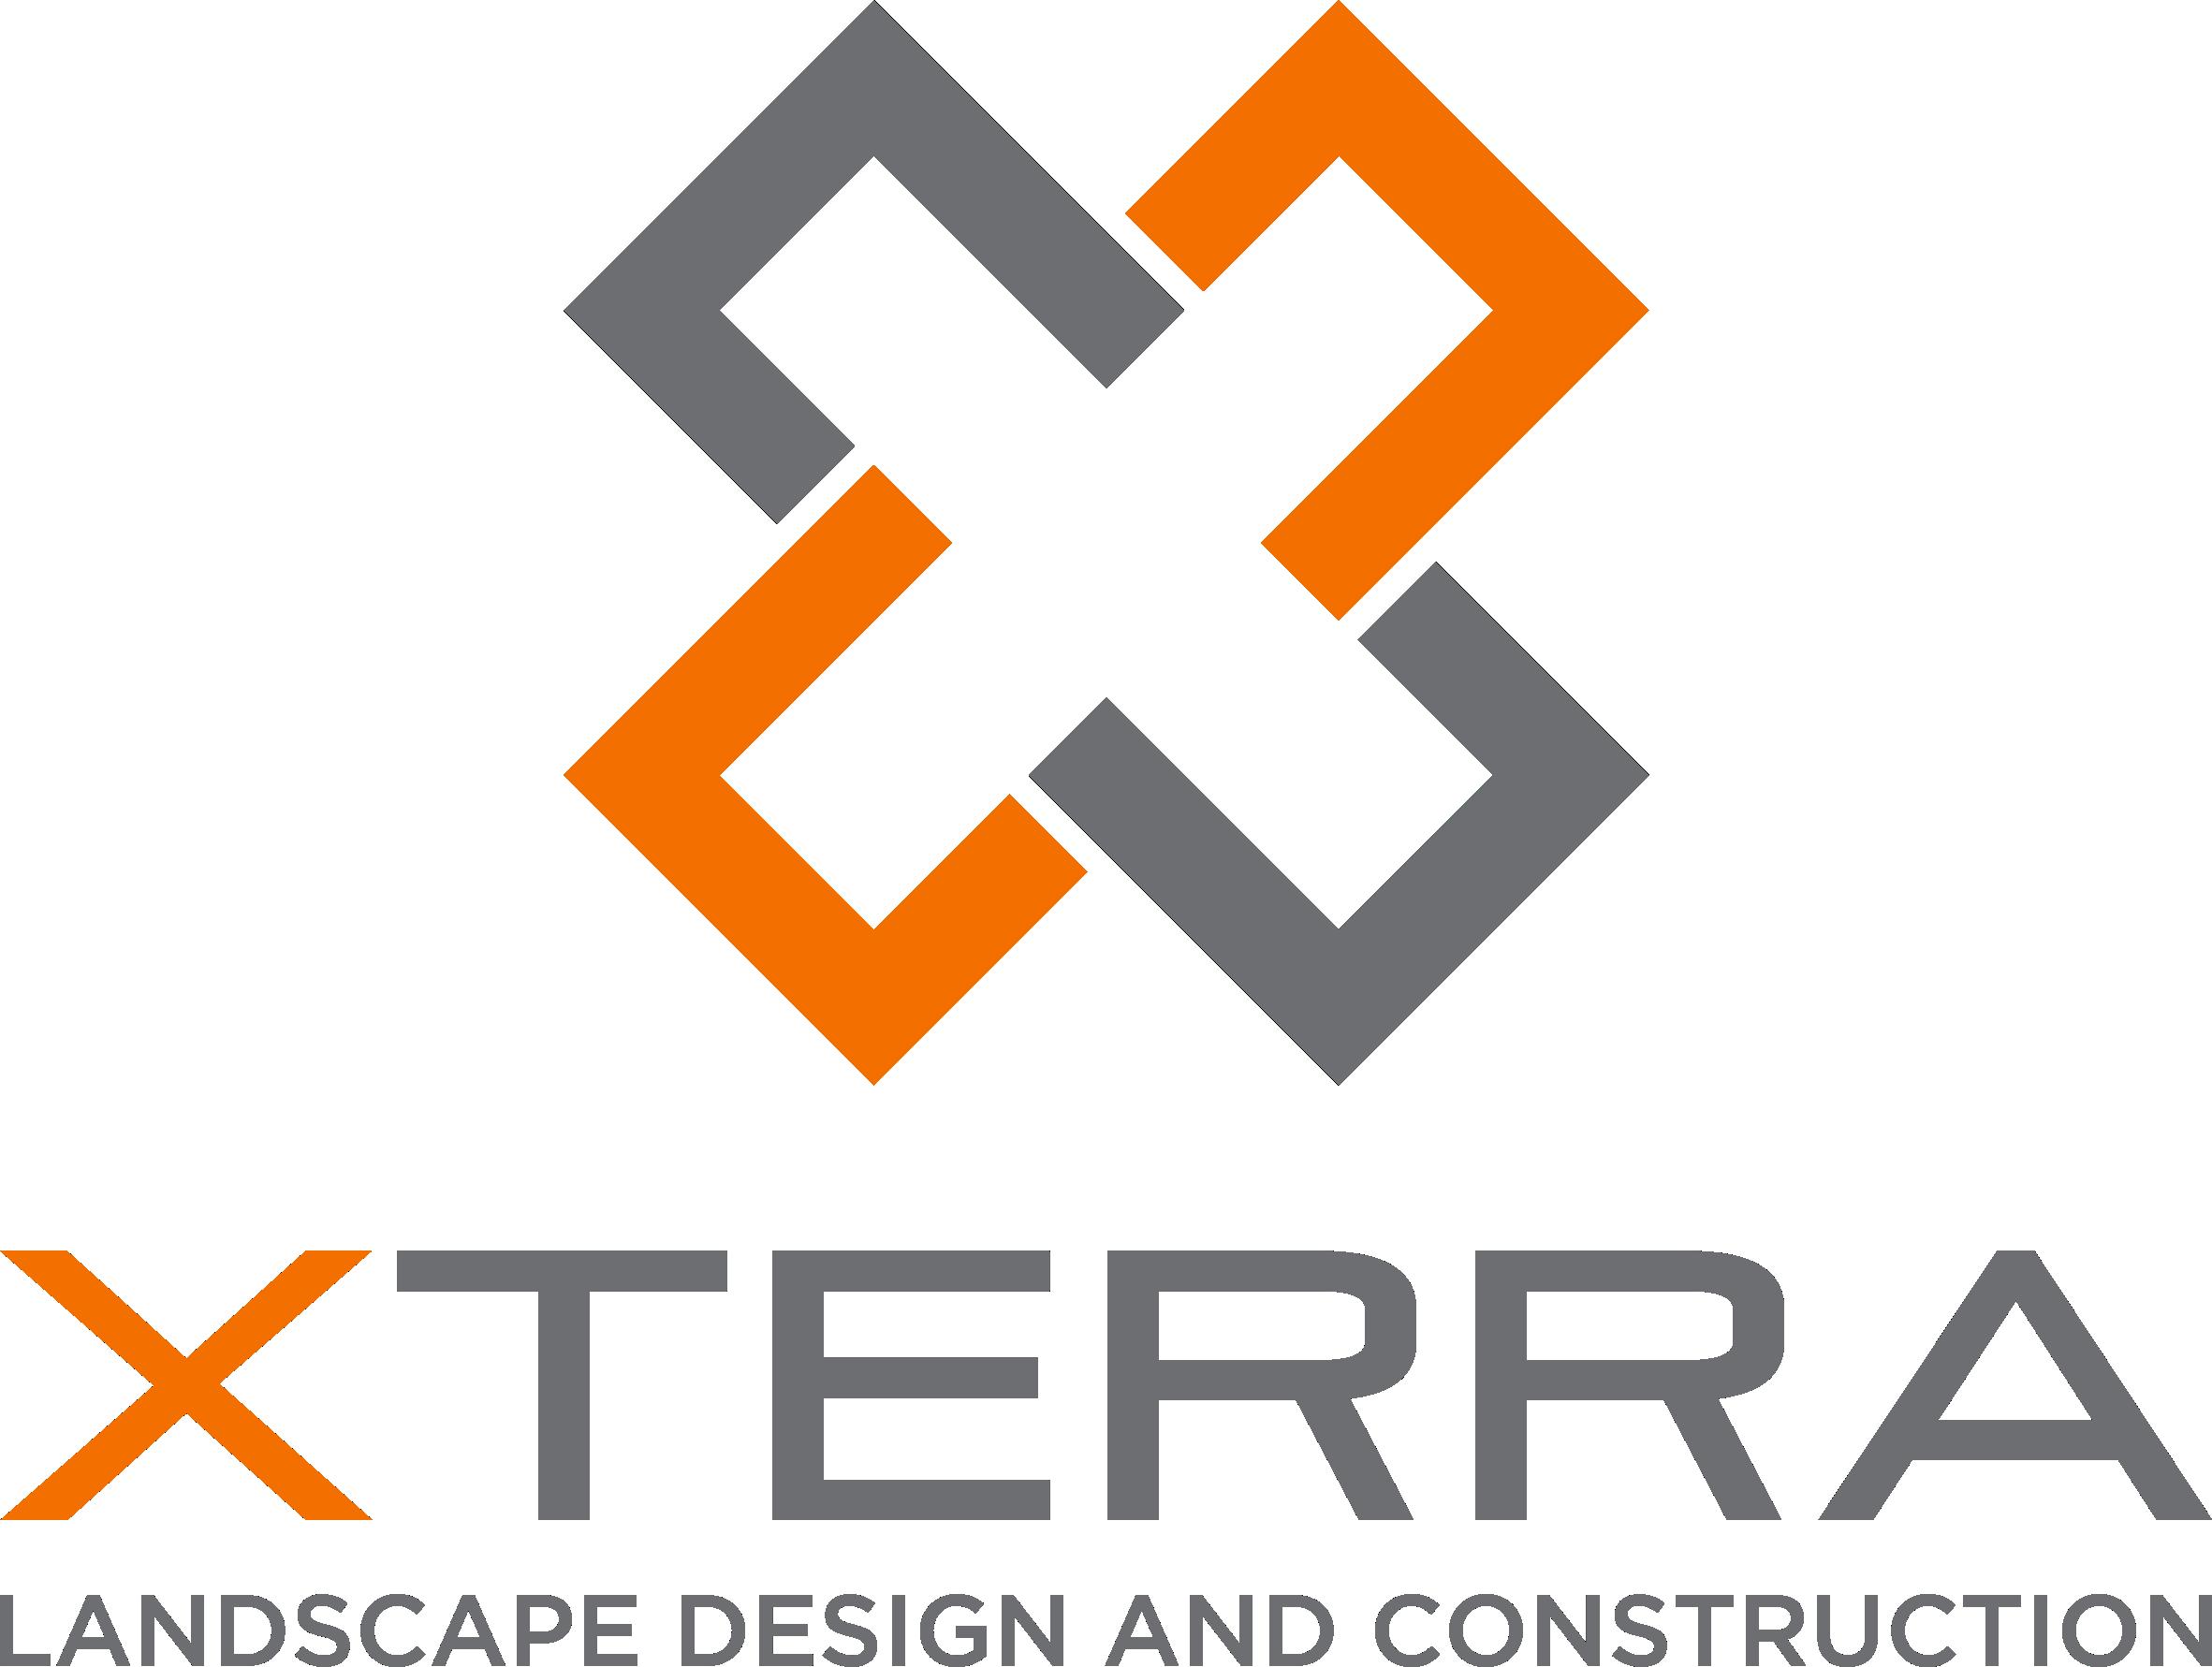 Landscape Construction company needs a fresh new logo